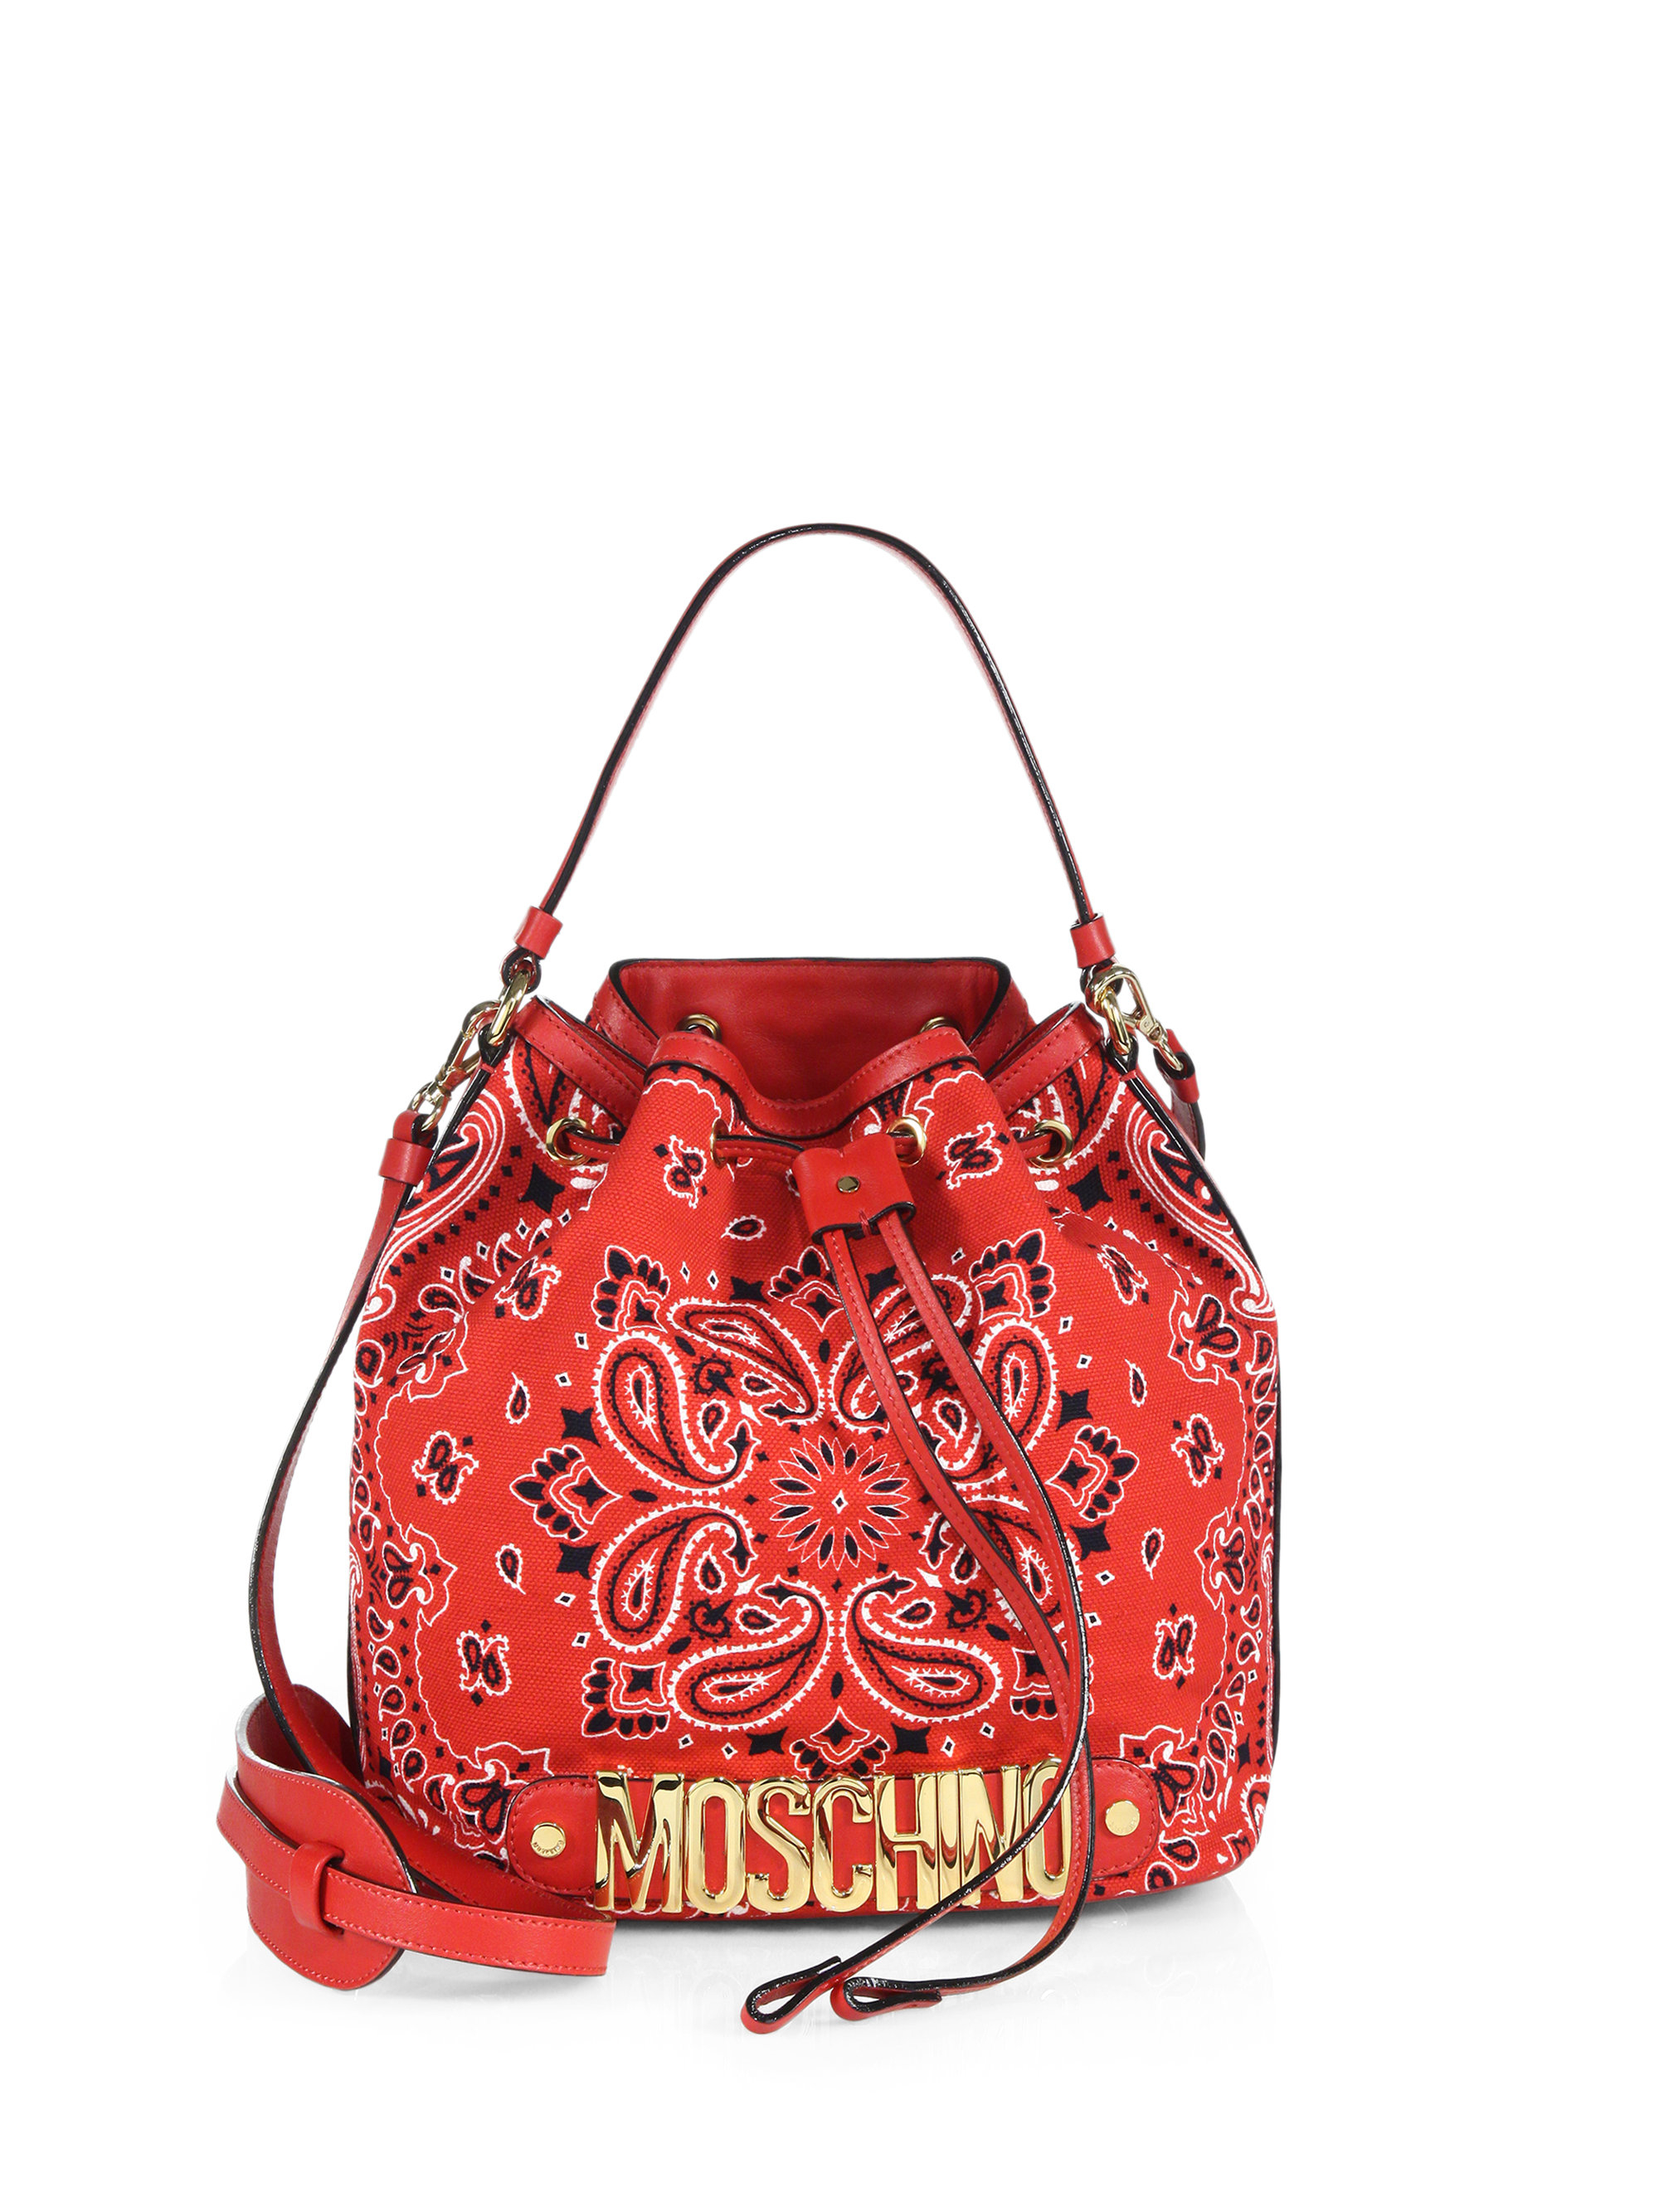 baed6c325f066 Moschino Bandana Canvas Bucket Bag in Red - Lyst